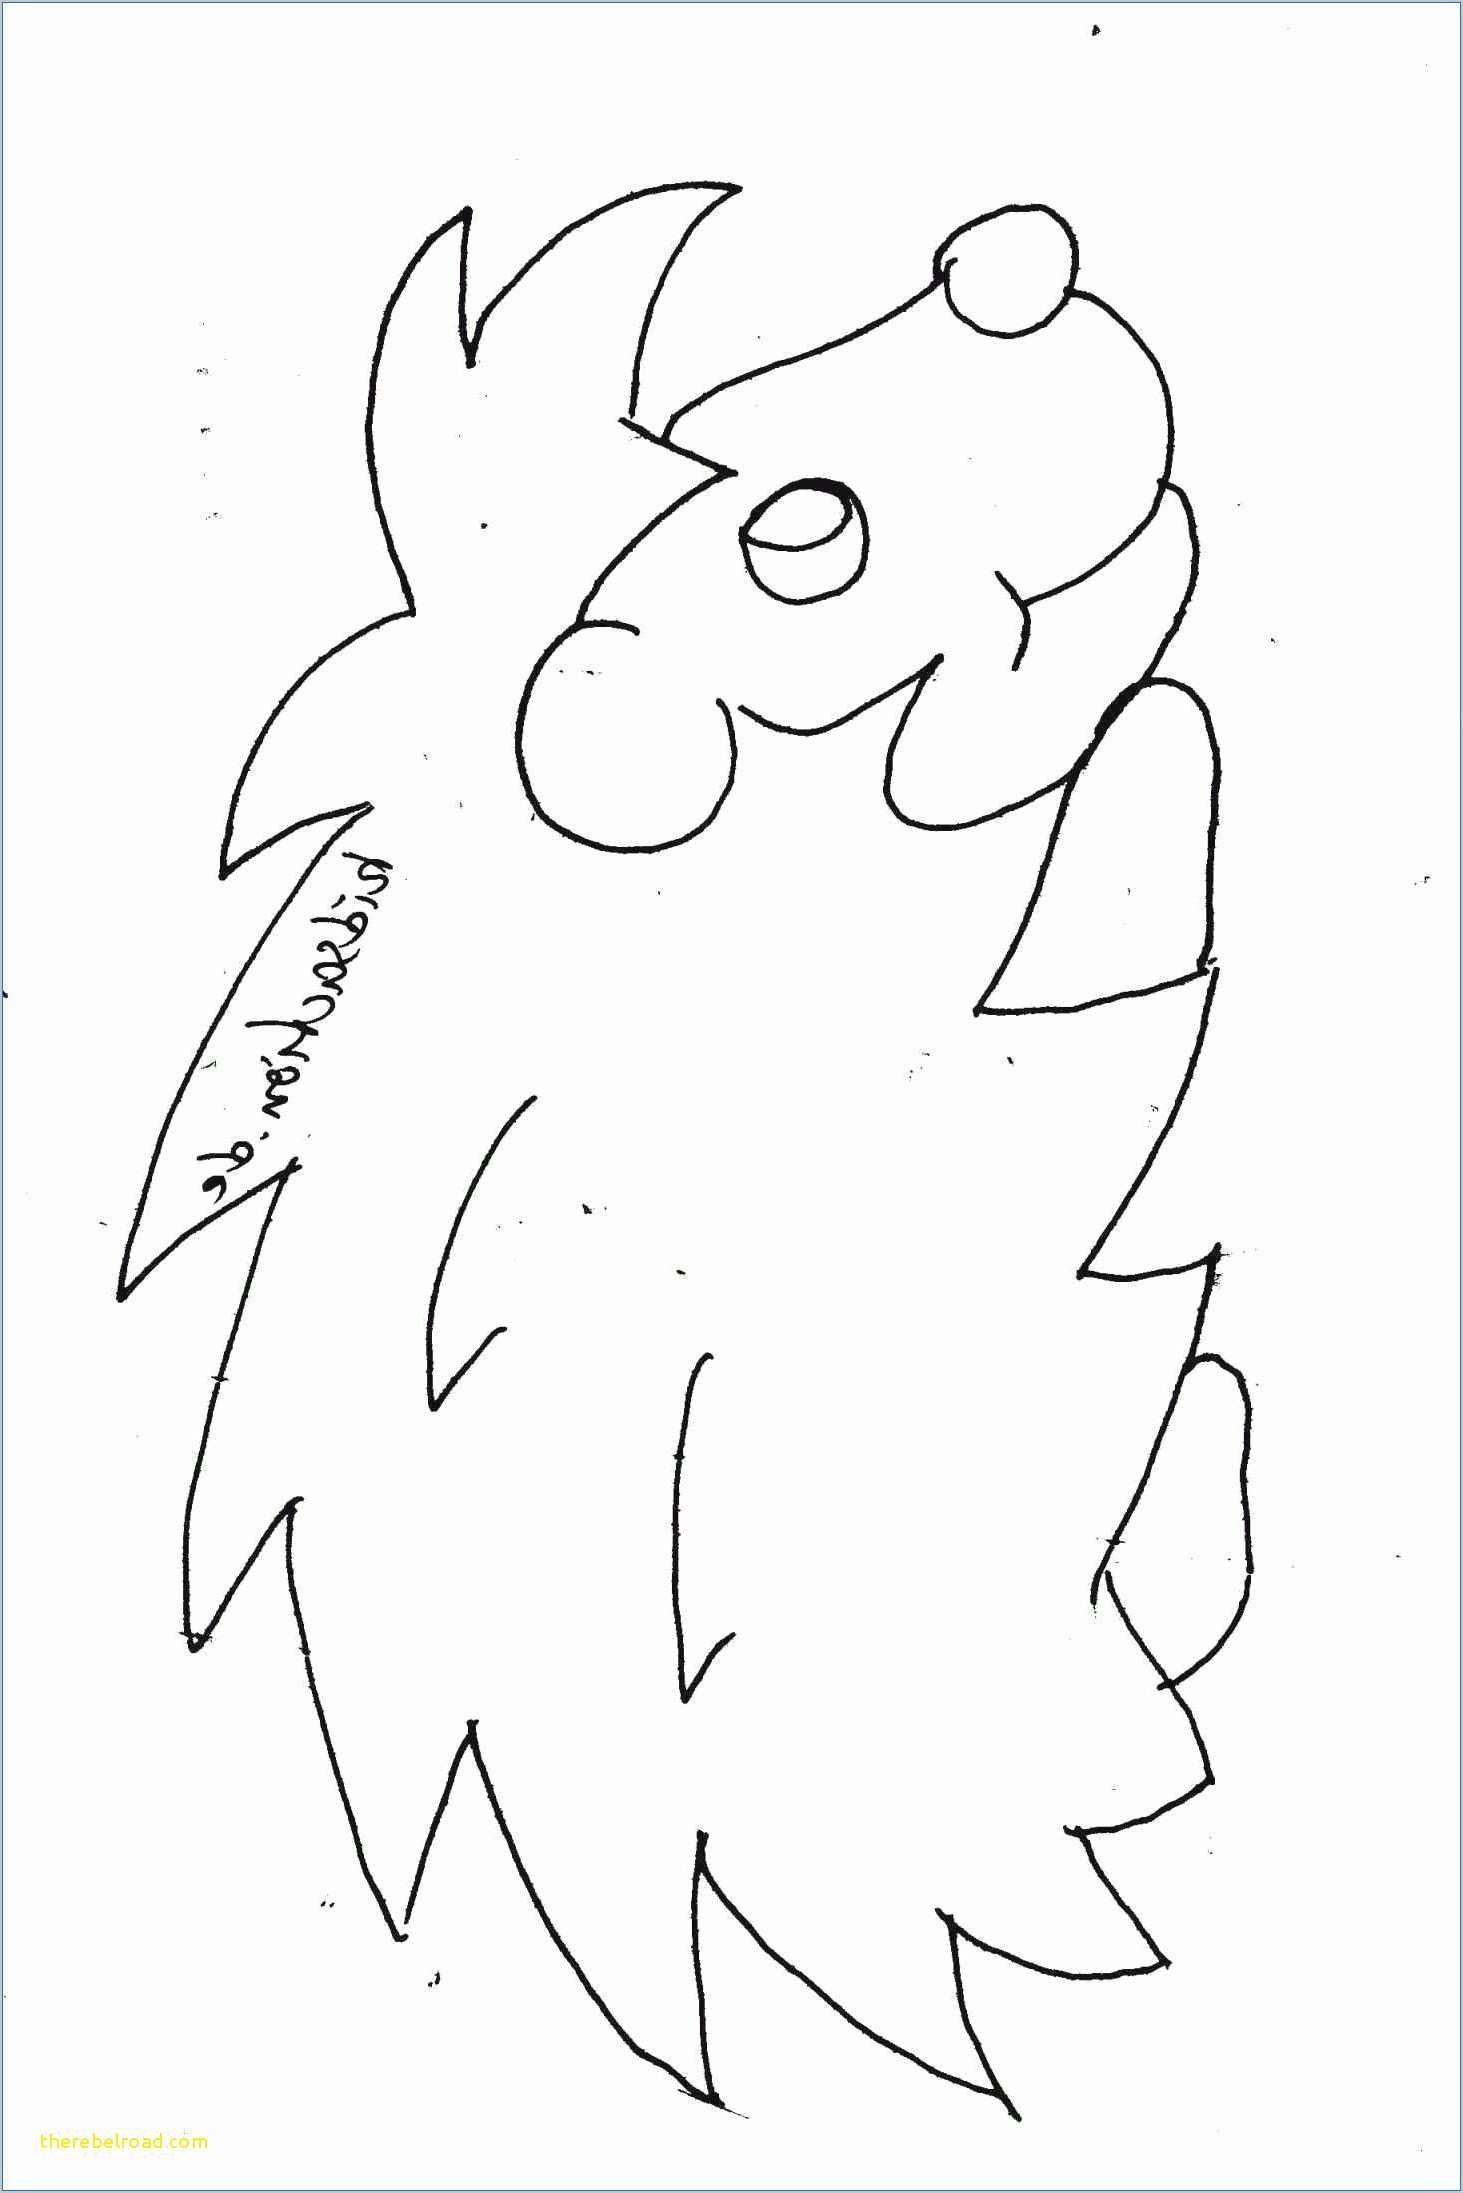 neu malvorlagen tiere fuchs | horse coloring pages